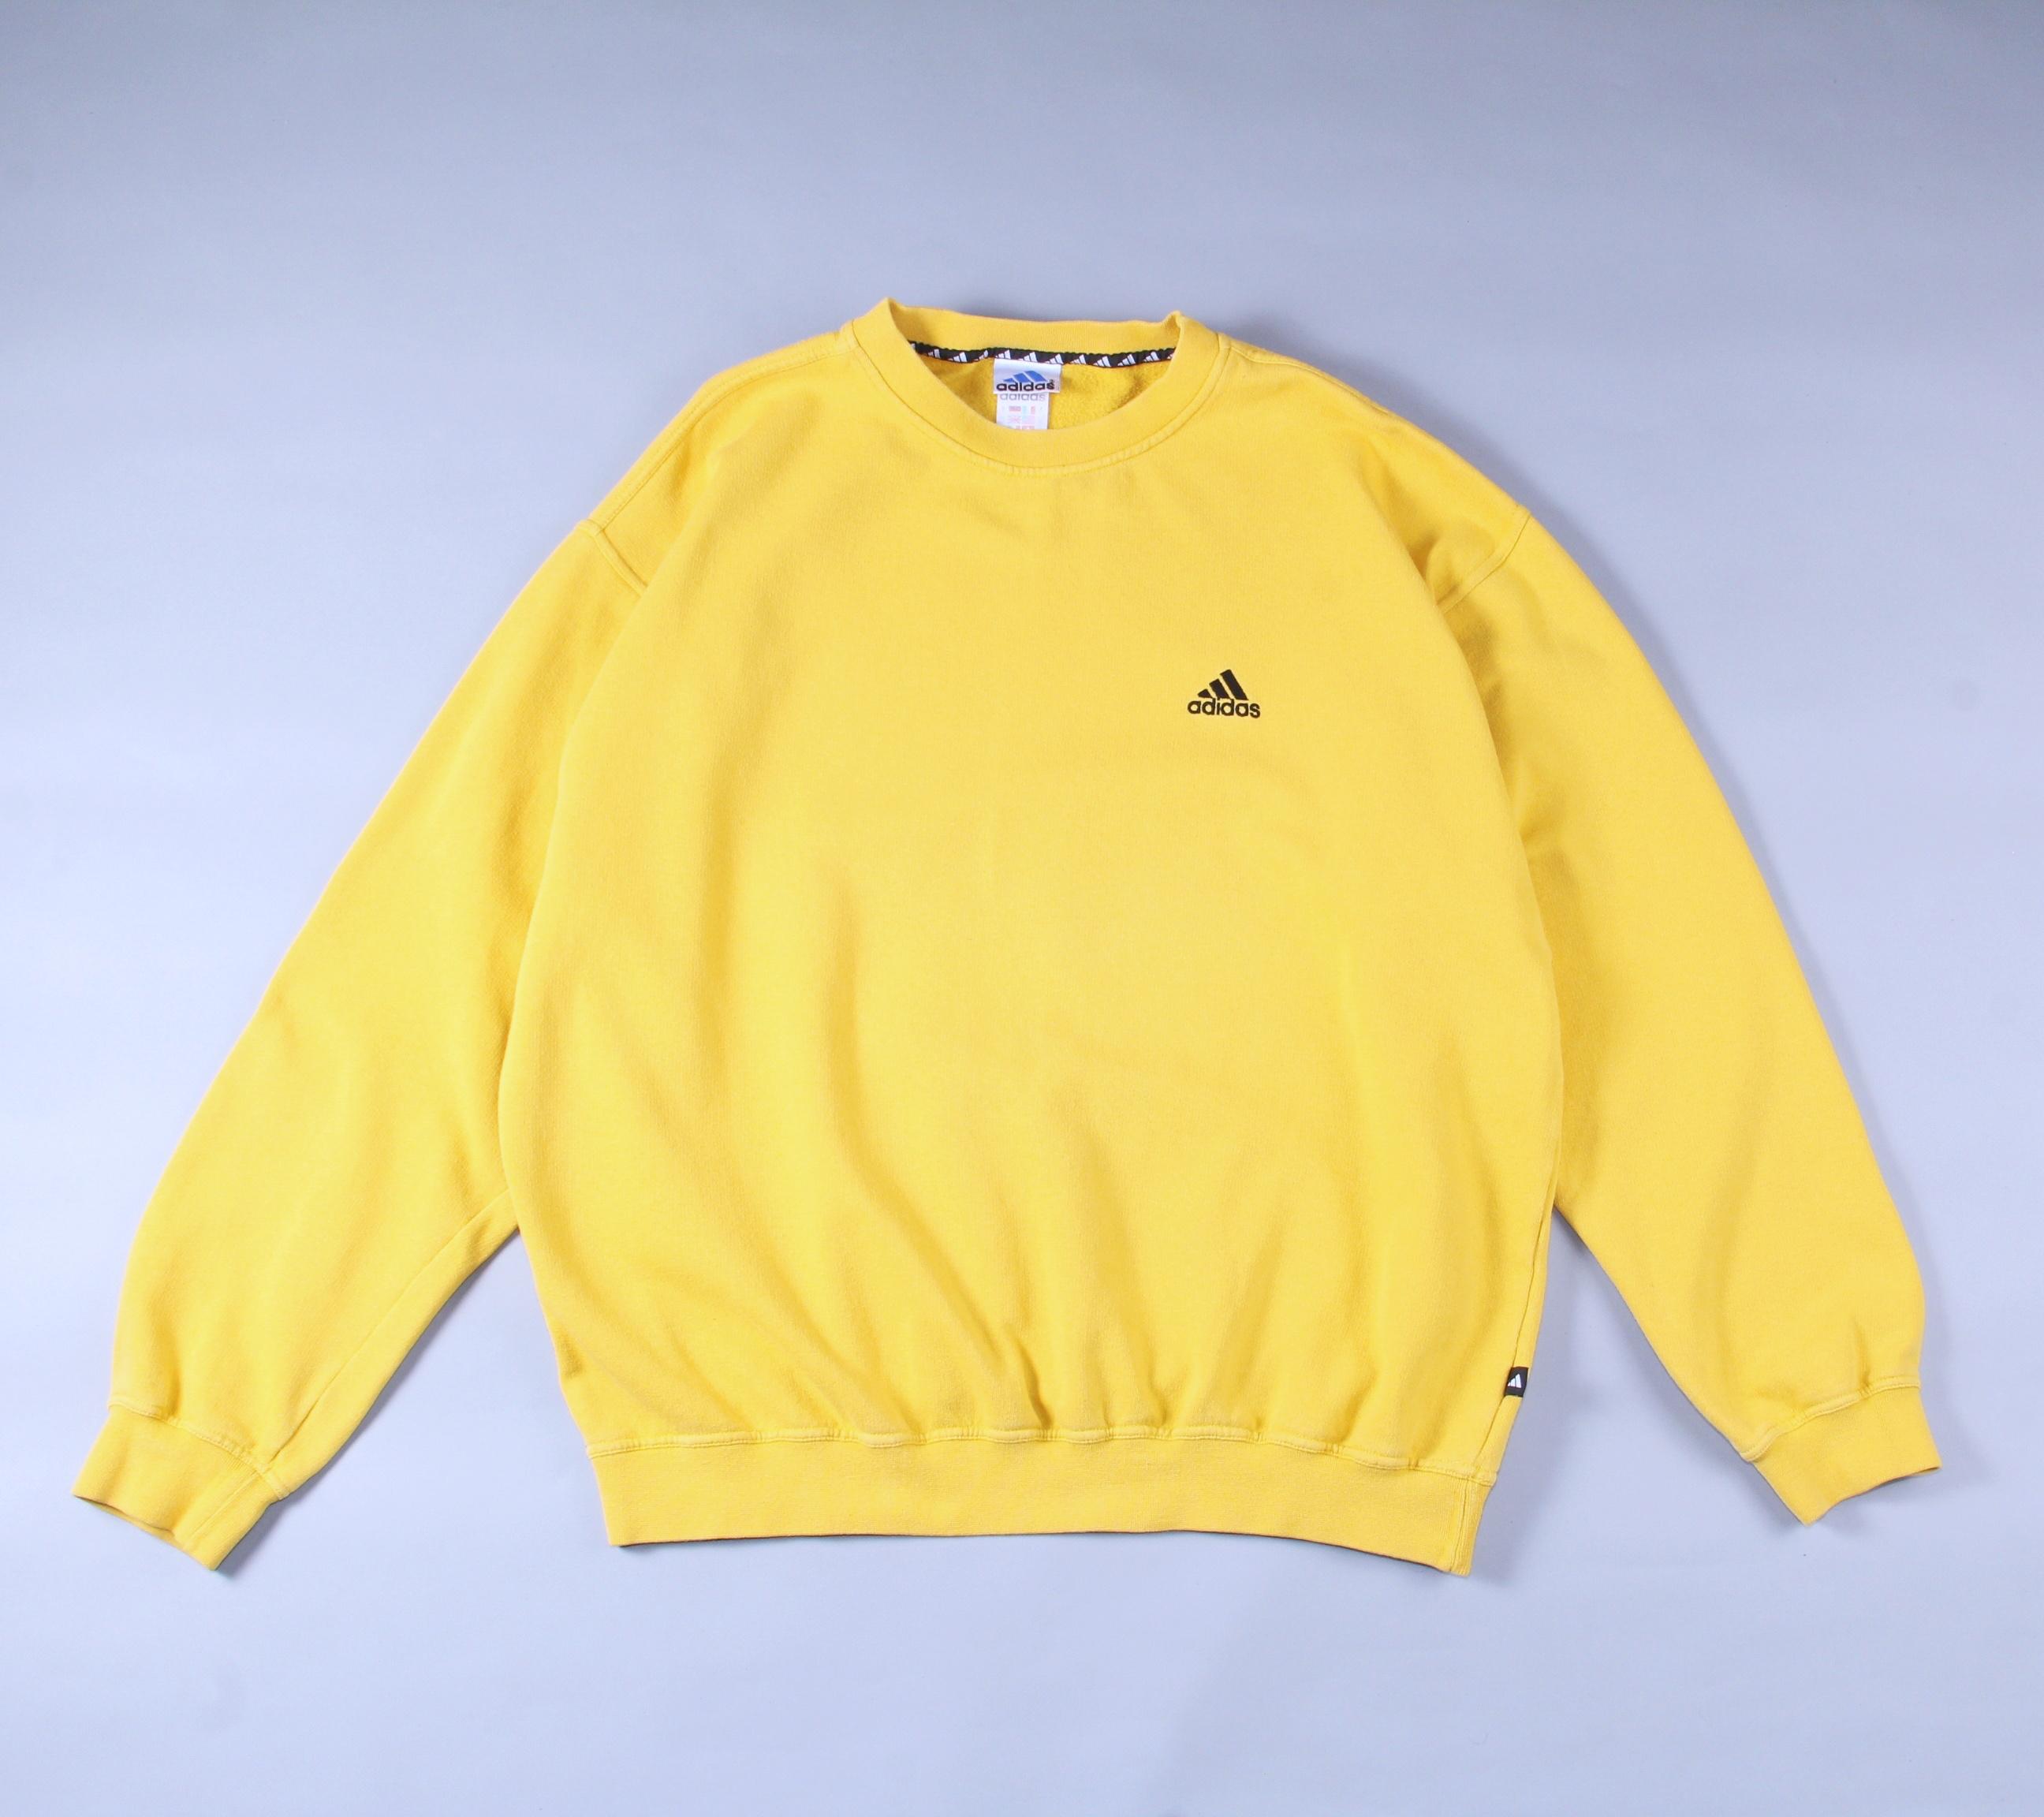 Bergantín rasguño Racional  Adidas Adidas Vintage Yellow Sweatshirt Size Xl   Grailed